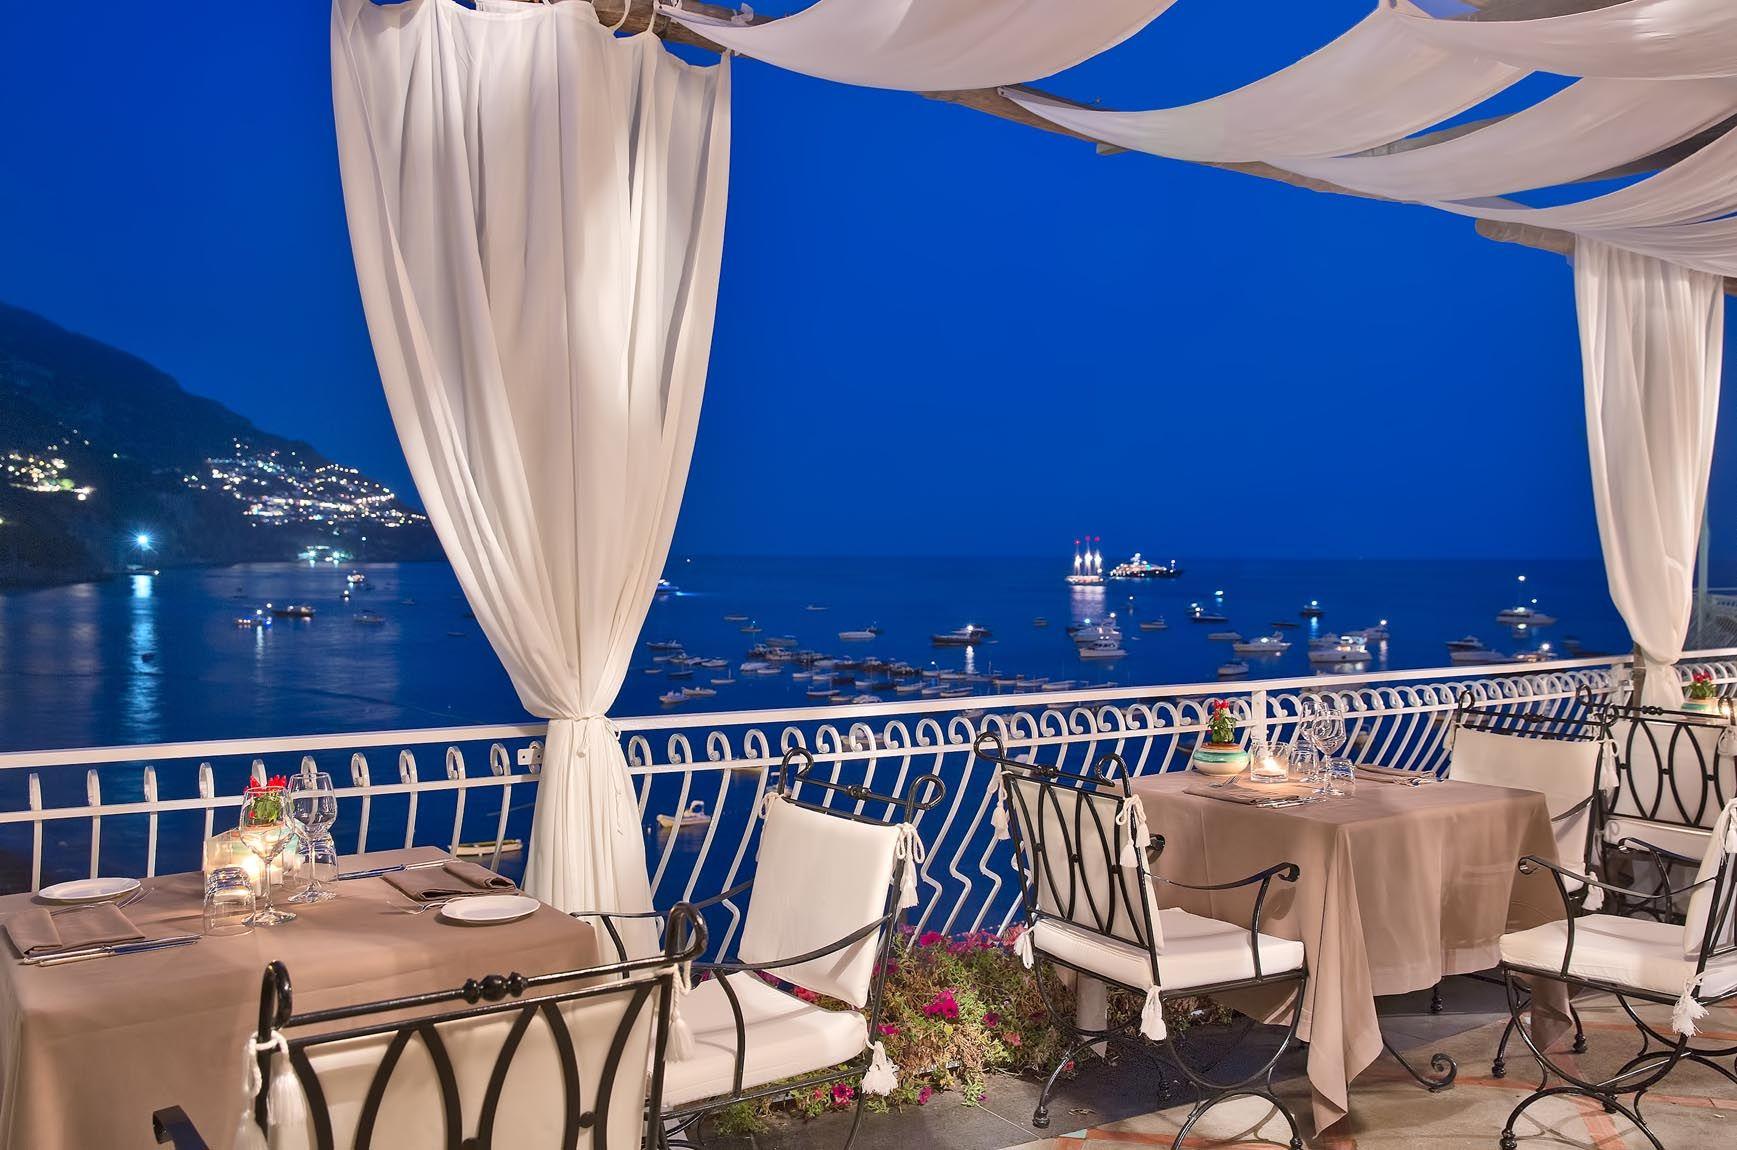 Positano Hotels 5 Star Amalfi Coast Italy Top Best Luxury Hotels